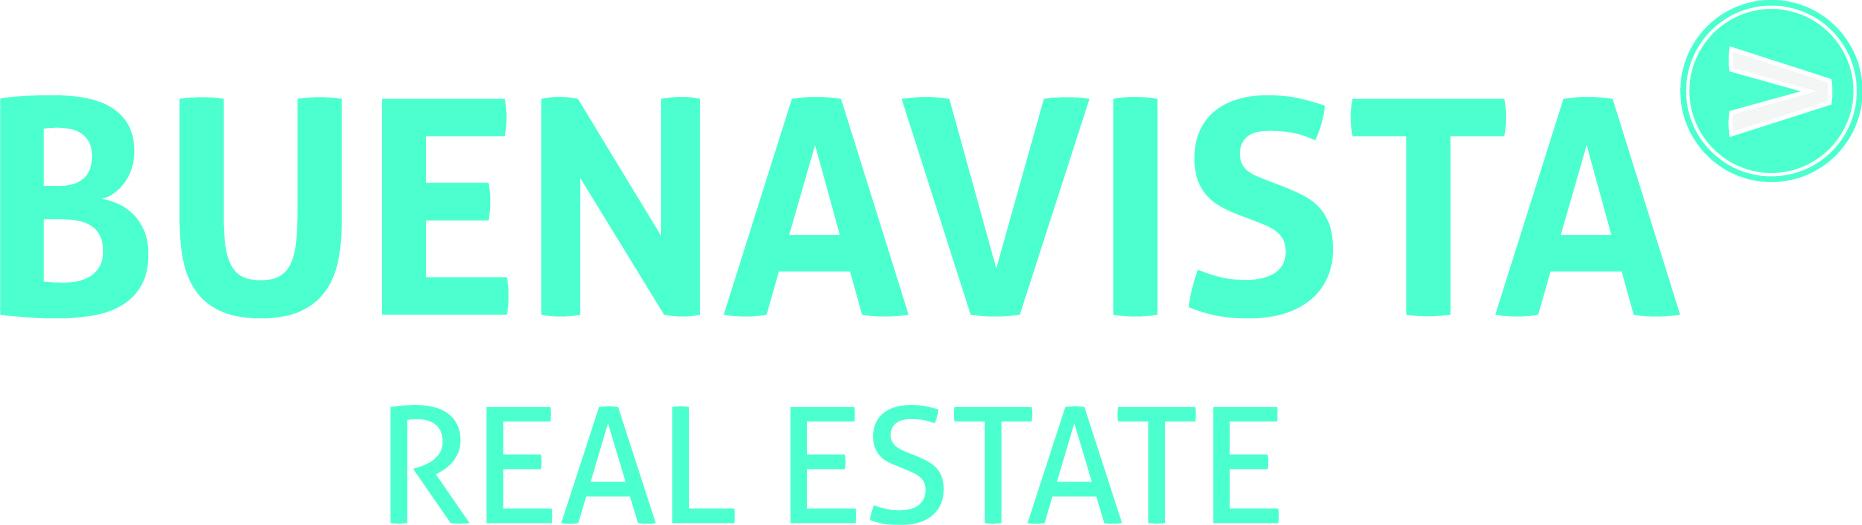 Buenavista Real Estate